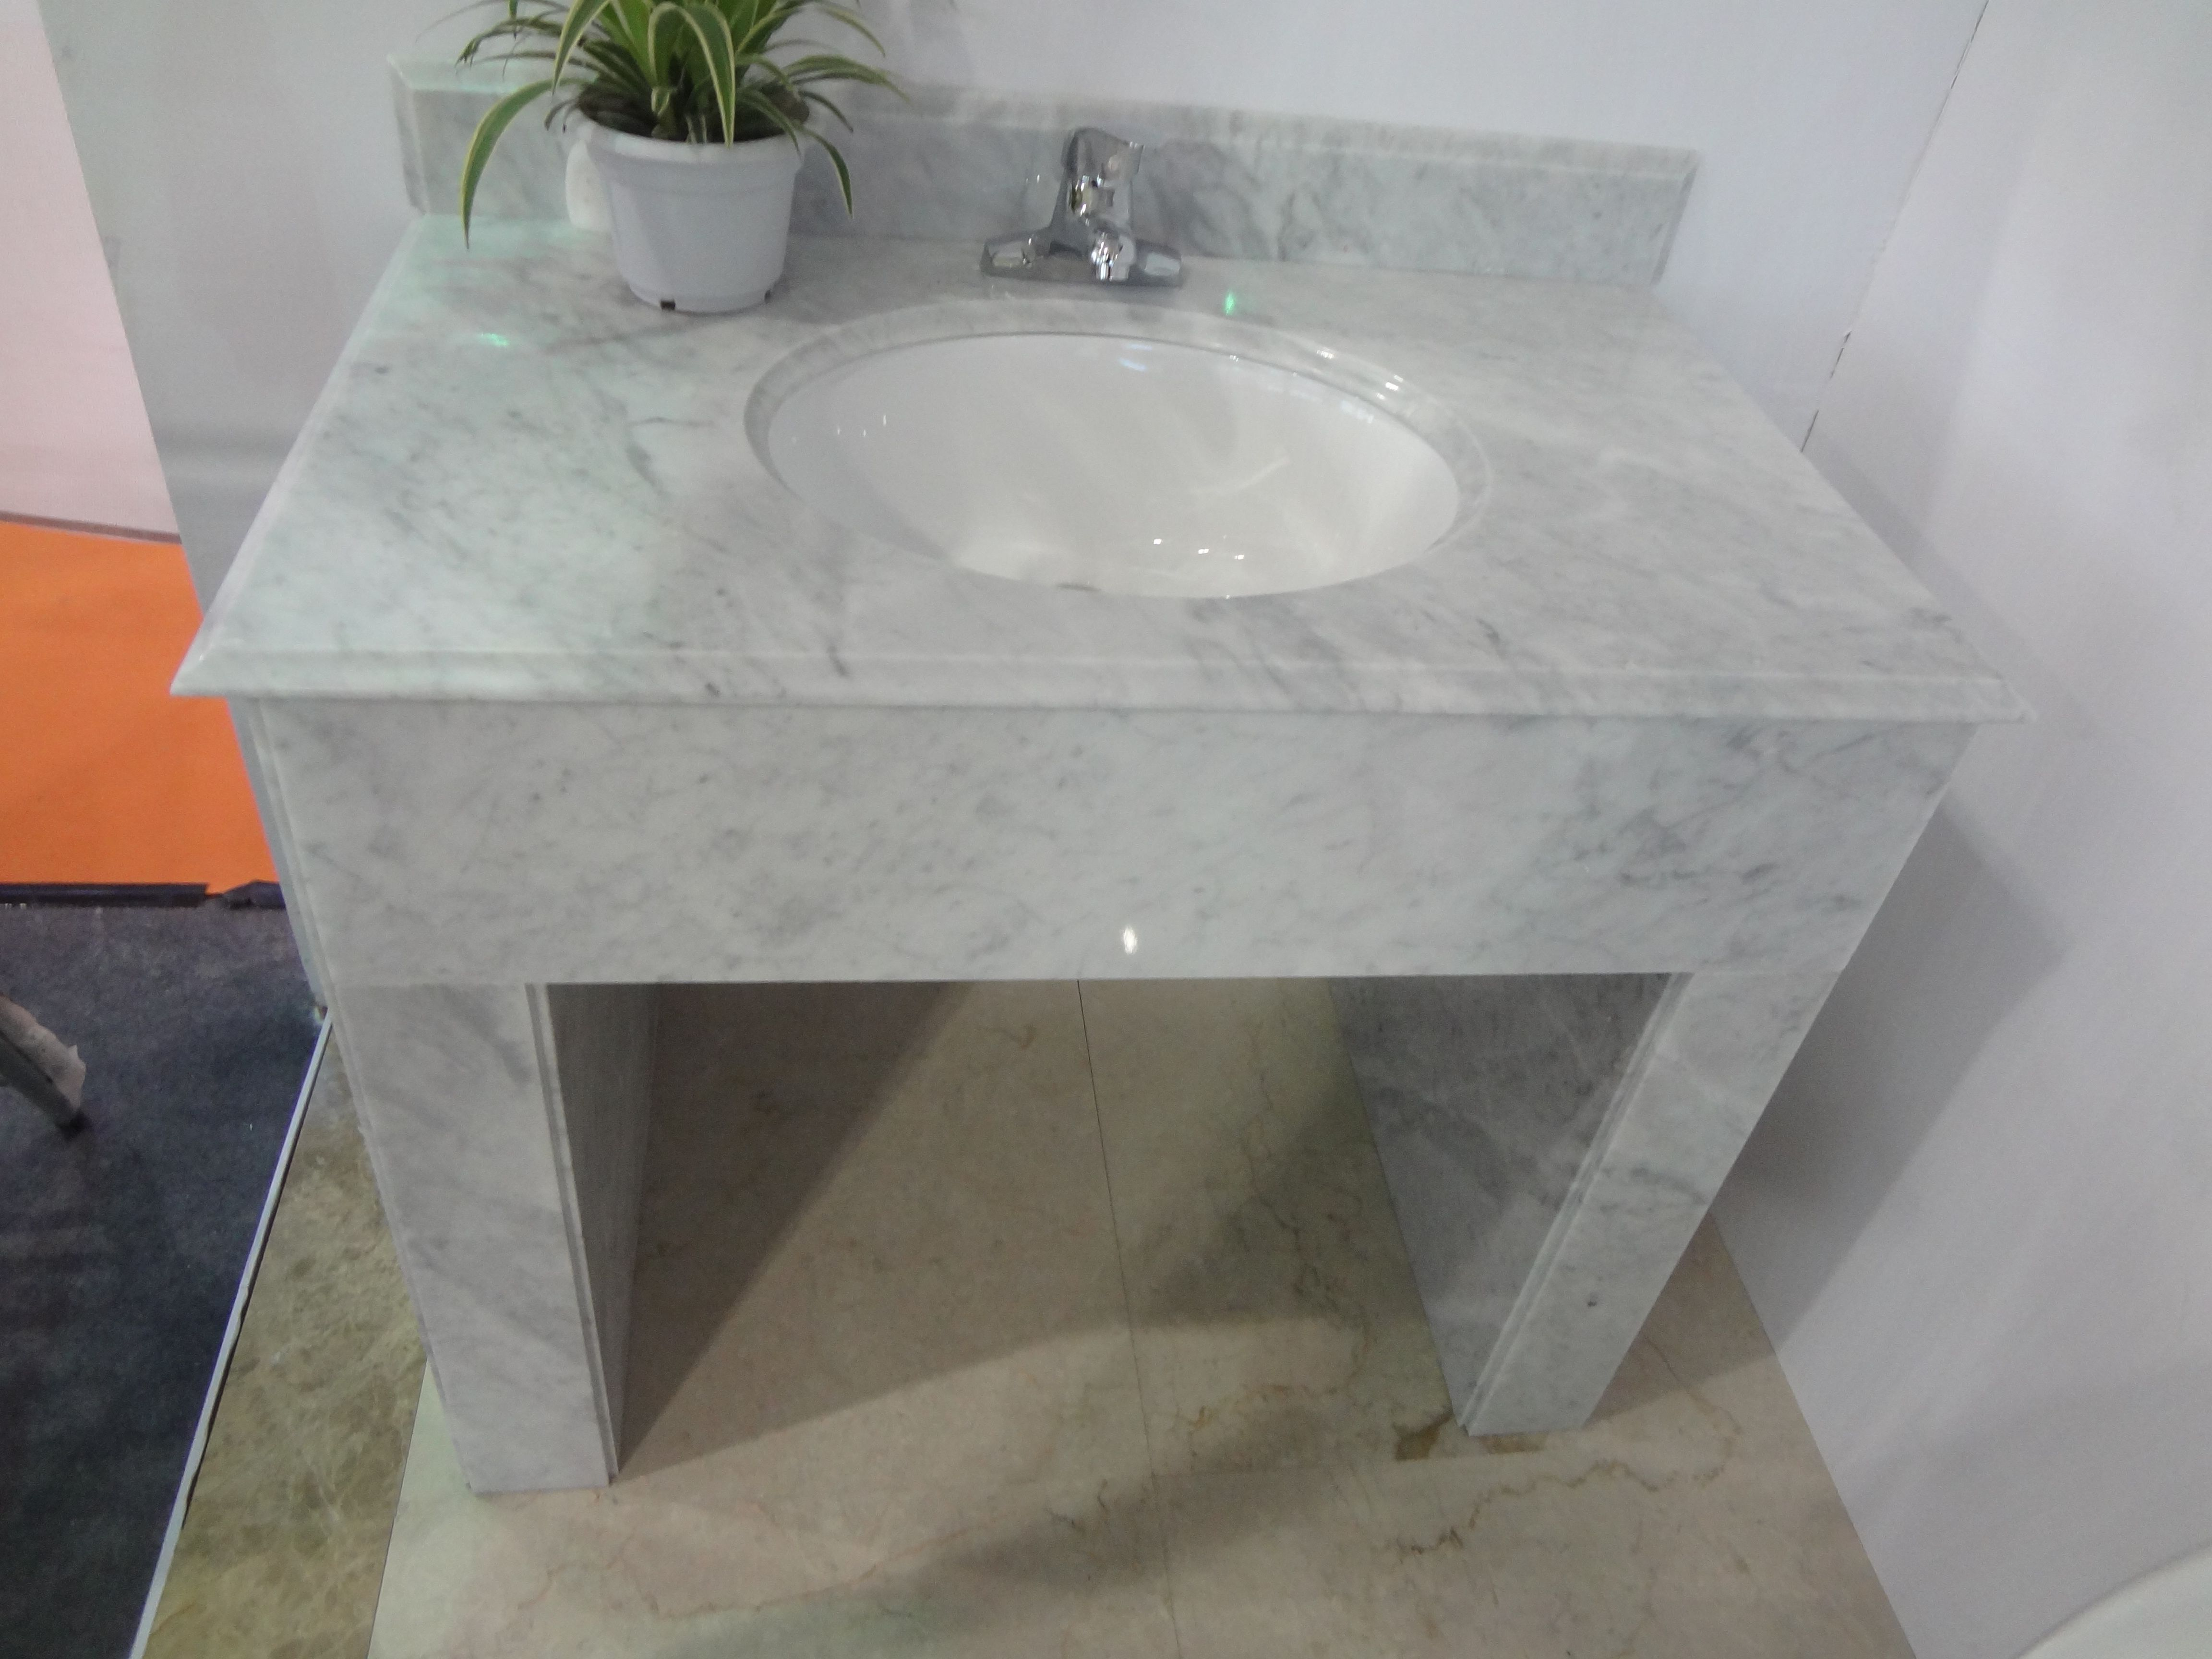 Newstar Marble Bathroom Top Factory Wholesale Cheap Precut Granite Countertops Countertops Granite Countertops Bathroom Top